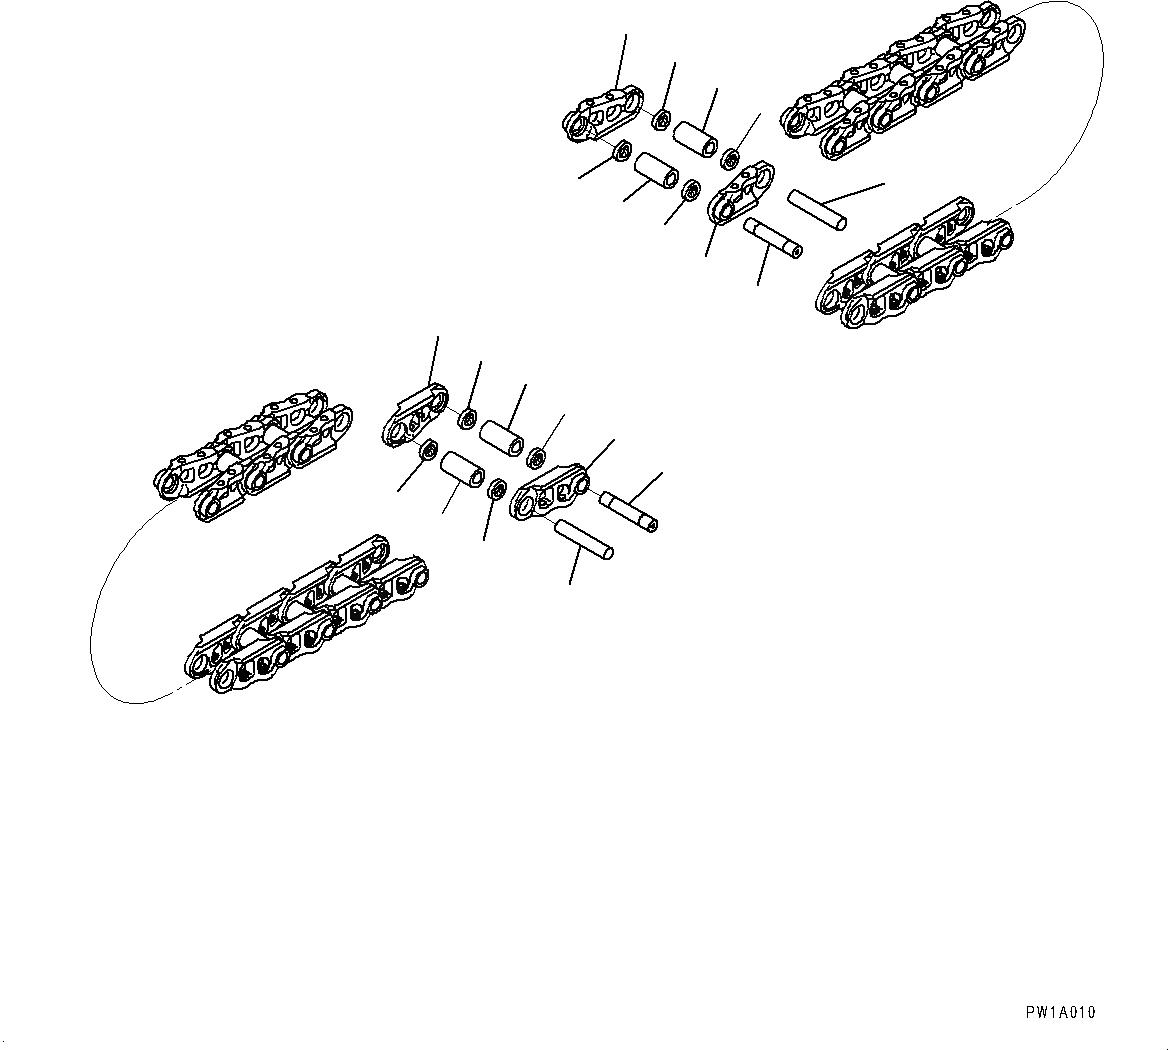 20Y-32-00310 Komatsu ЦЕПЬ В СБОРЕ